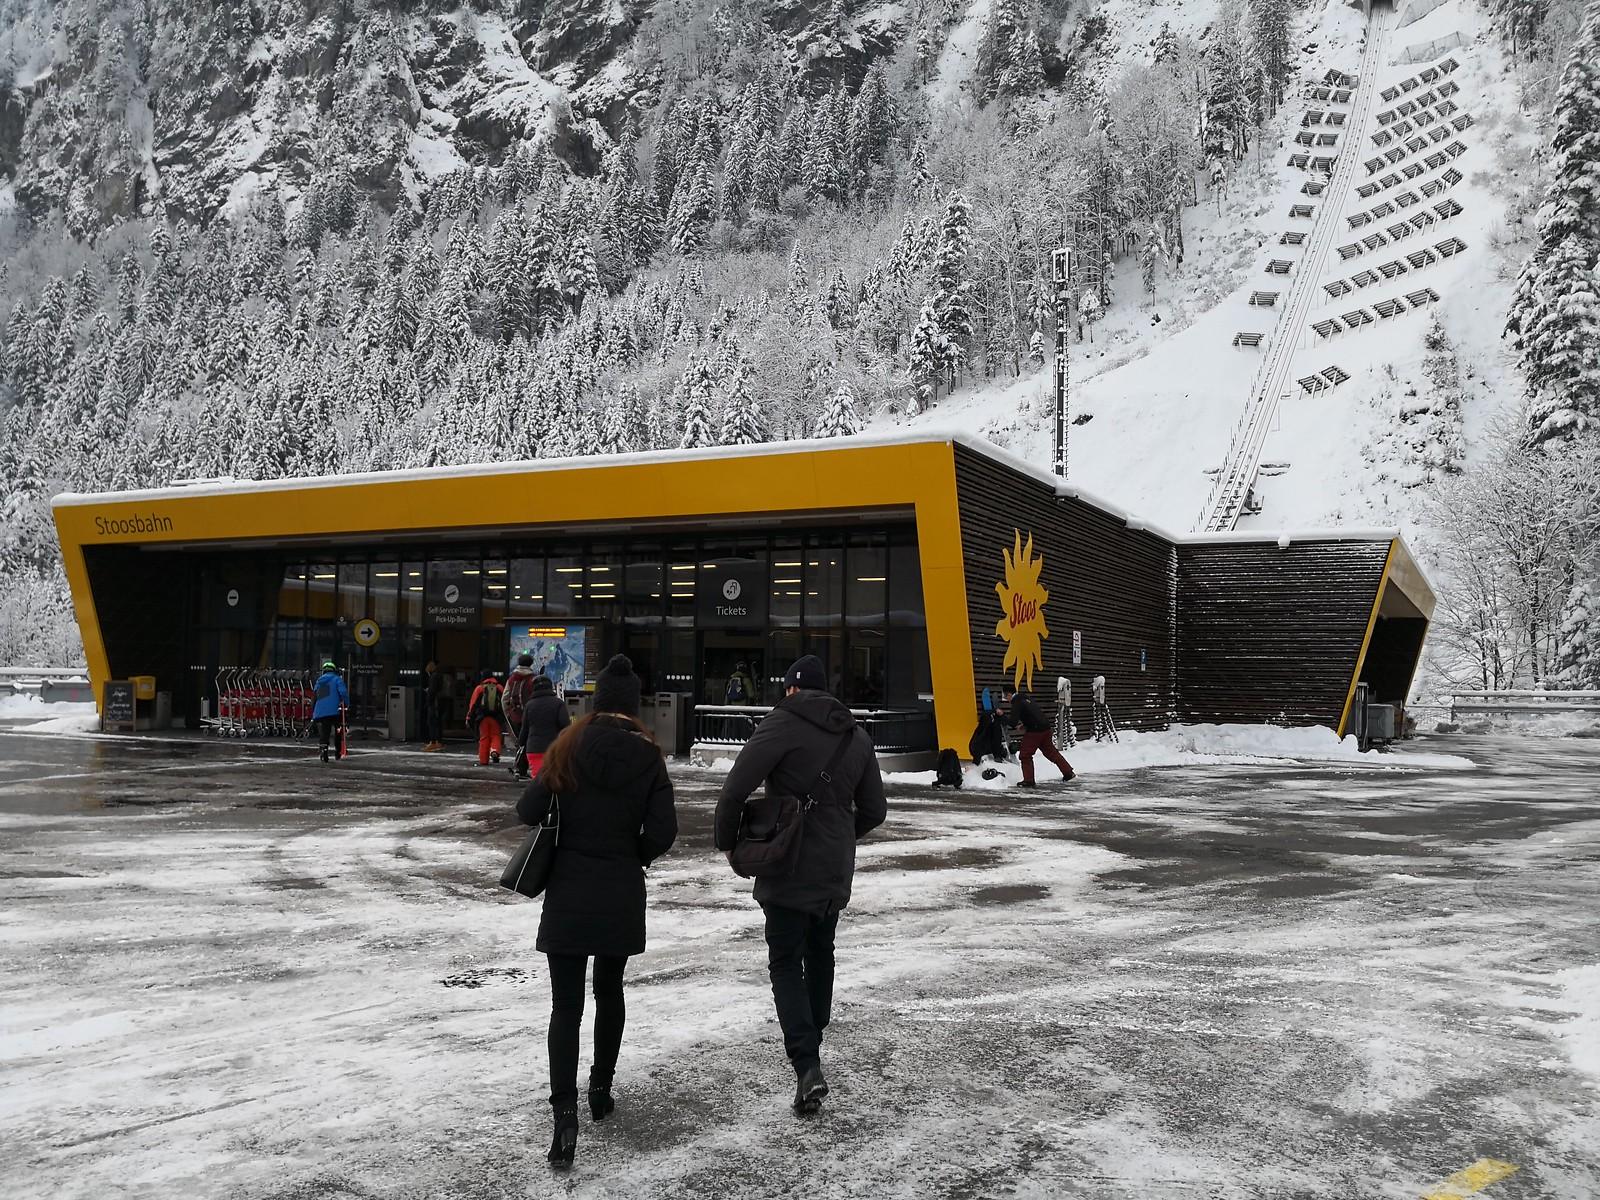 Stoosbahn Funicular Station